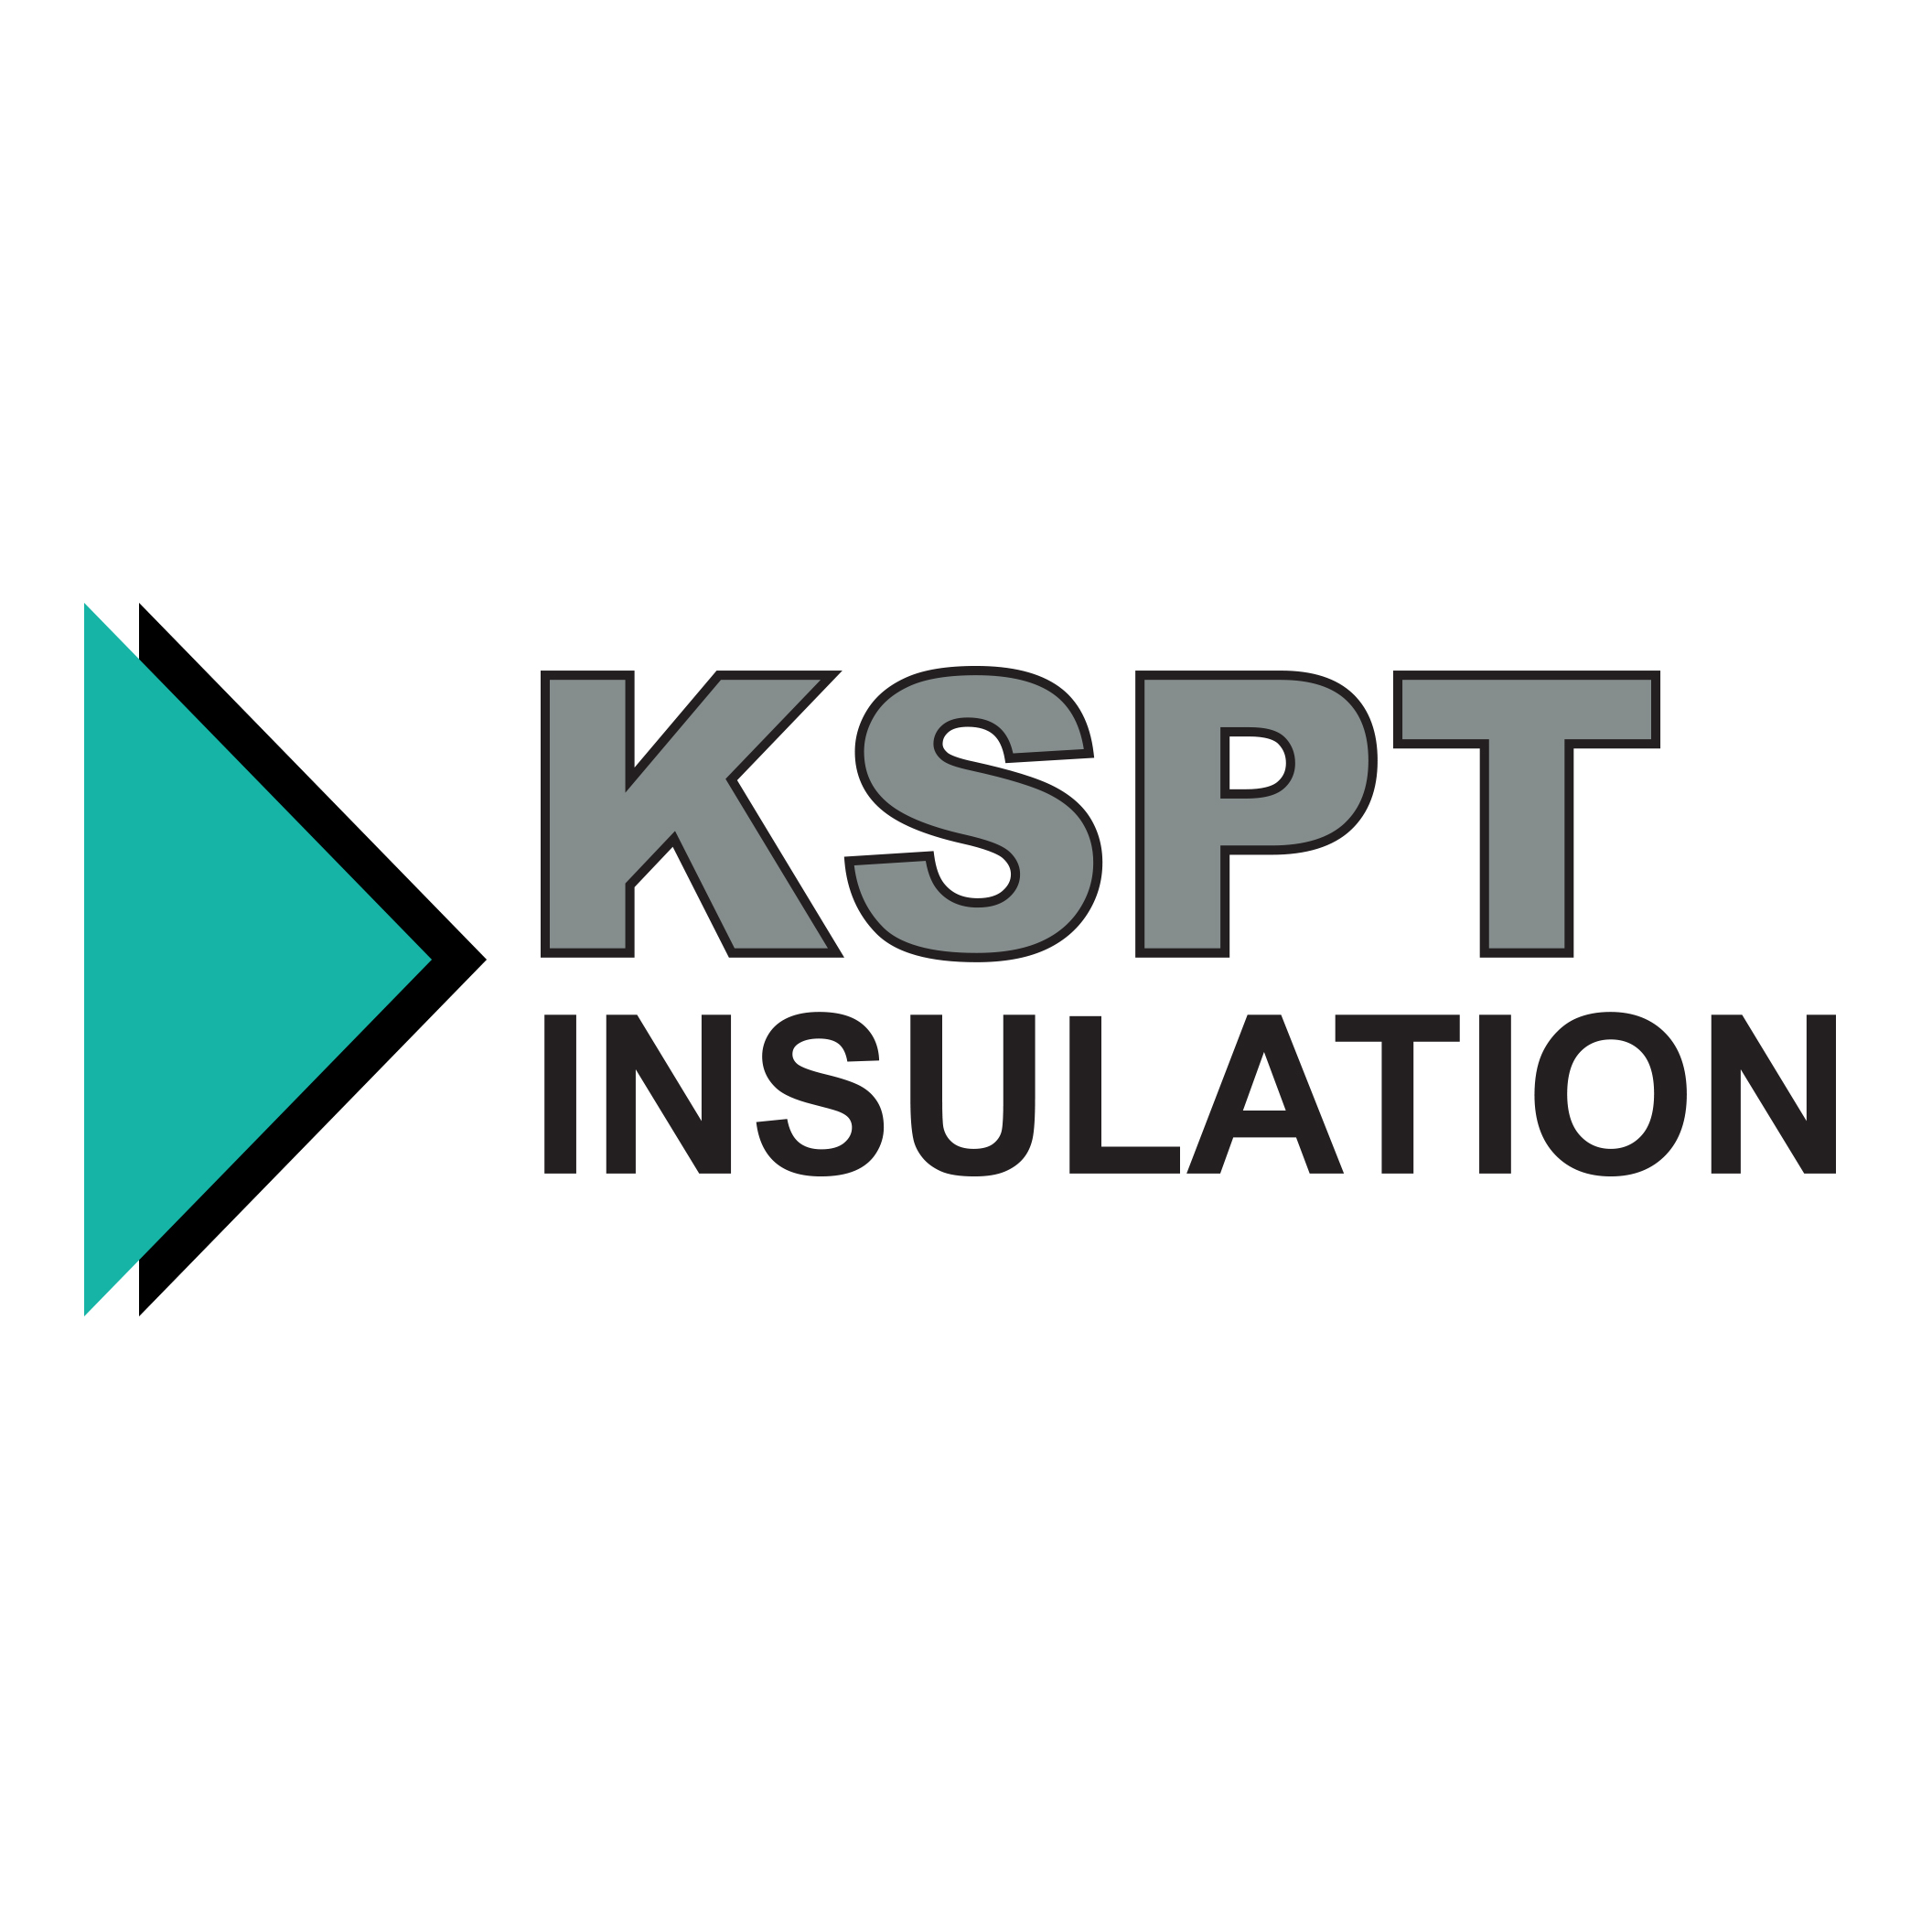 KSPT-Insulation Oy